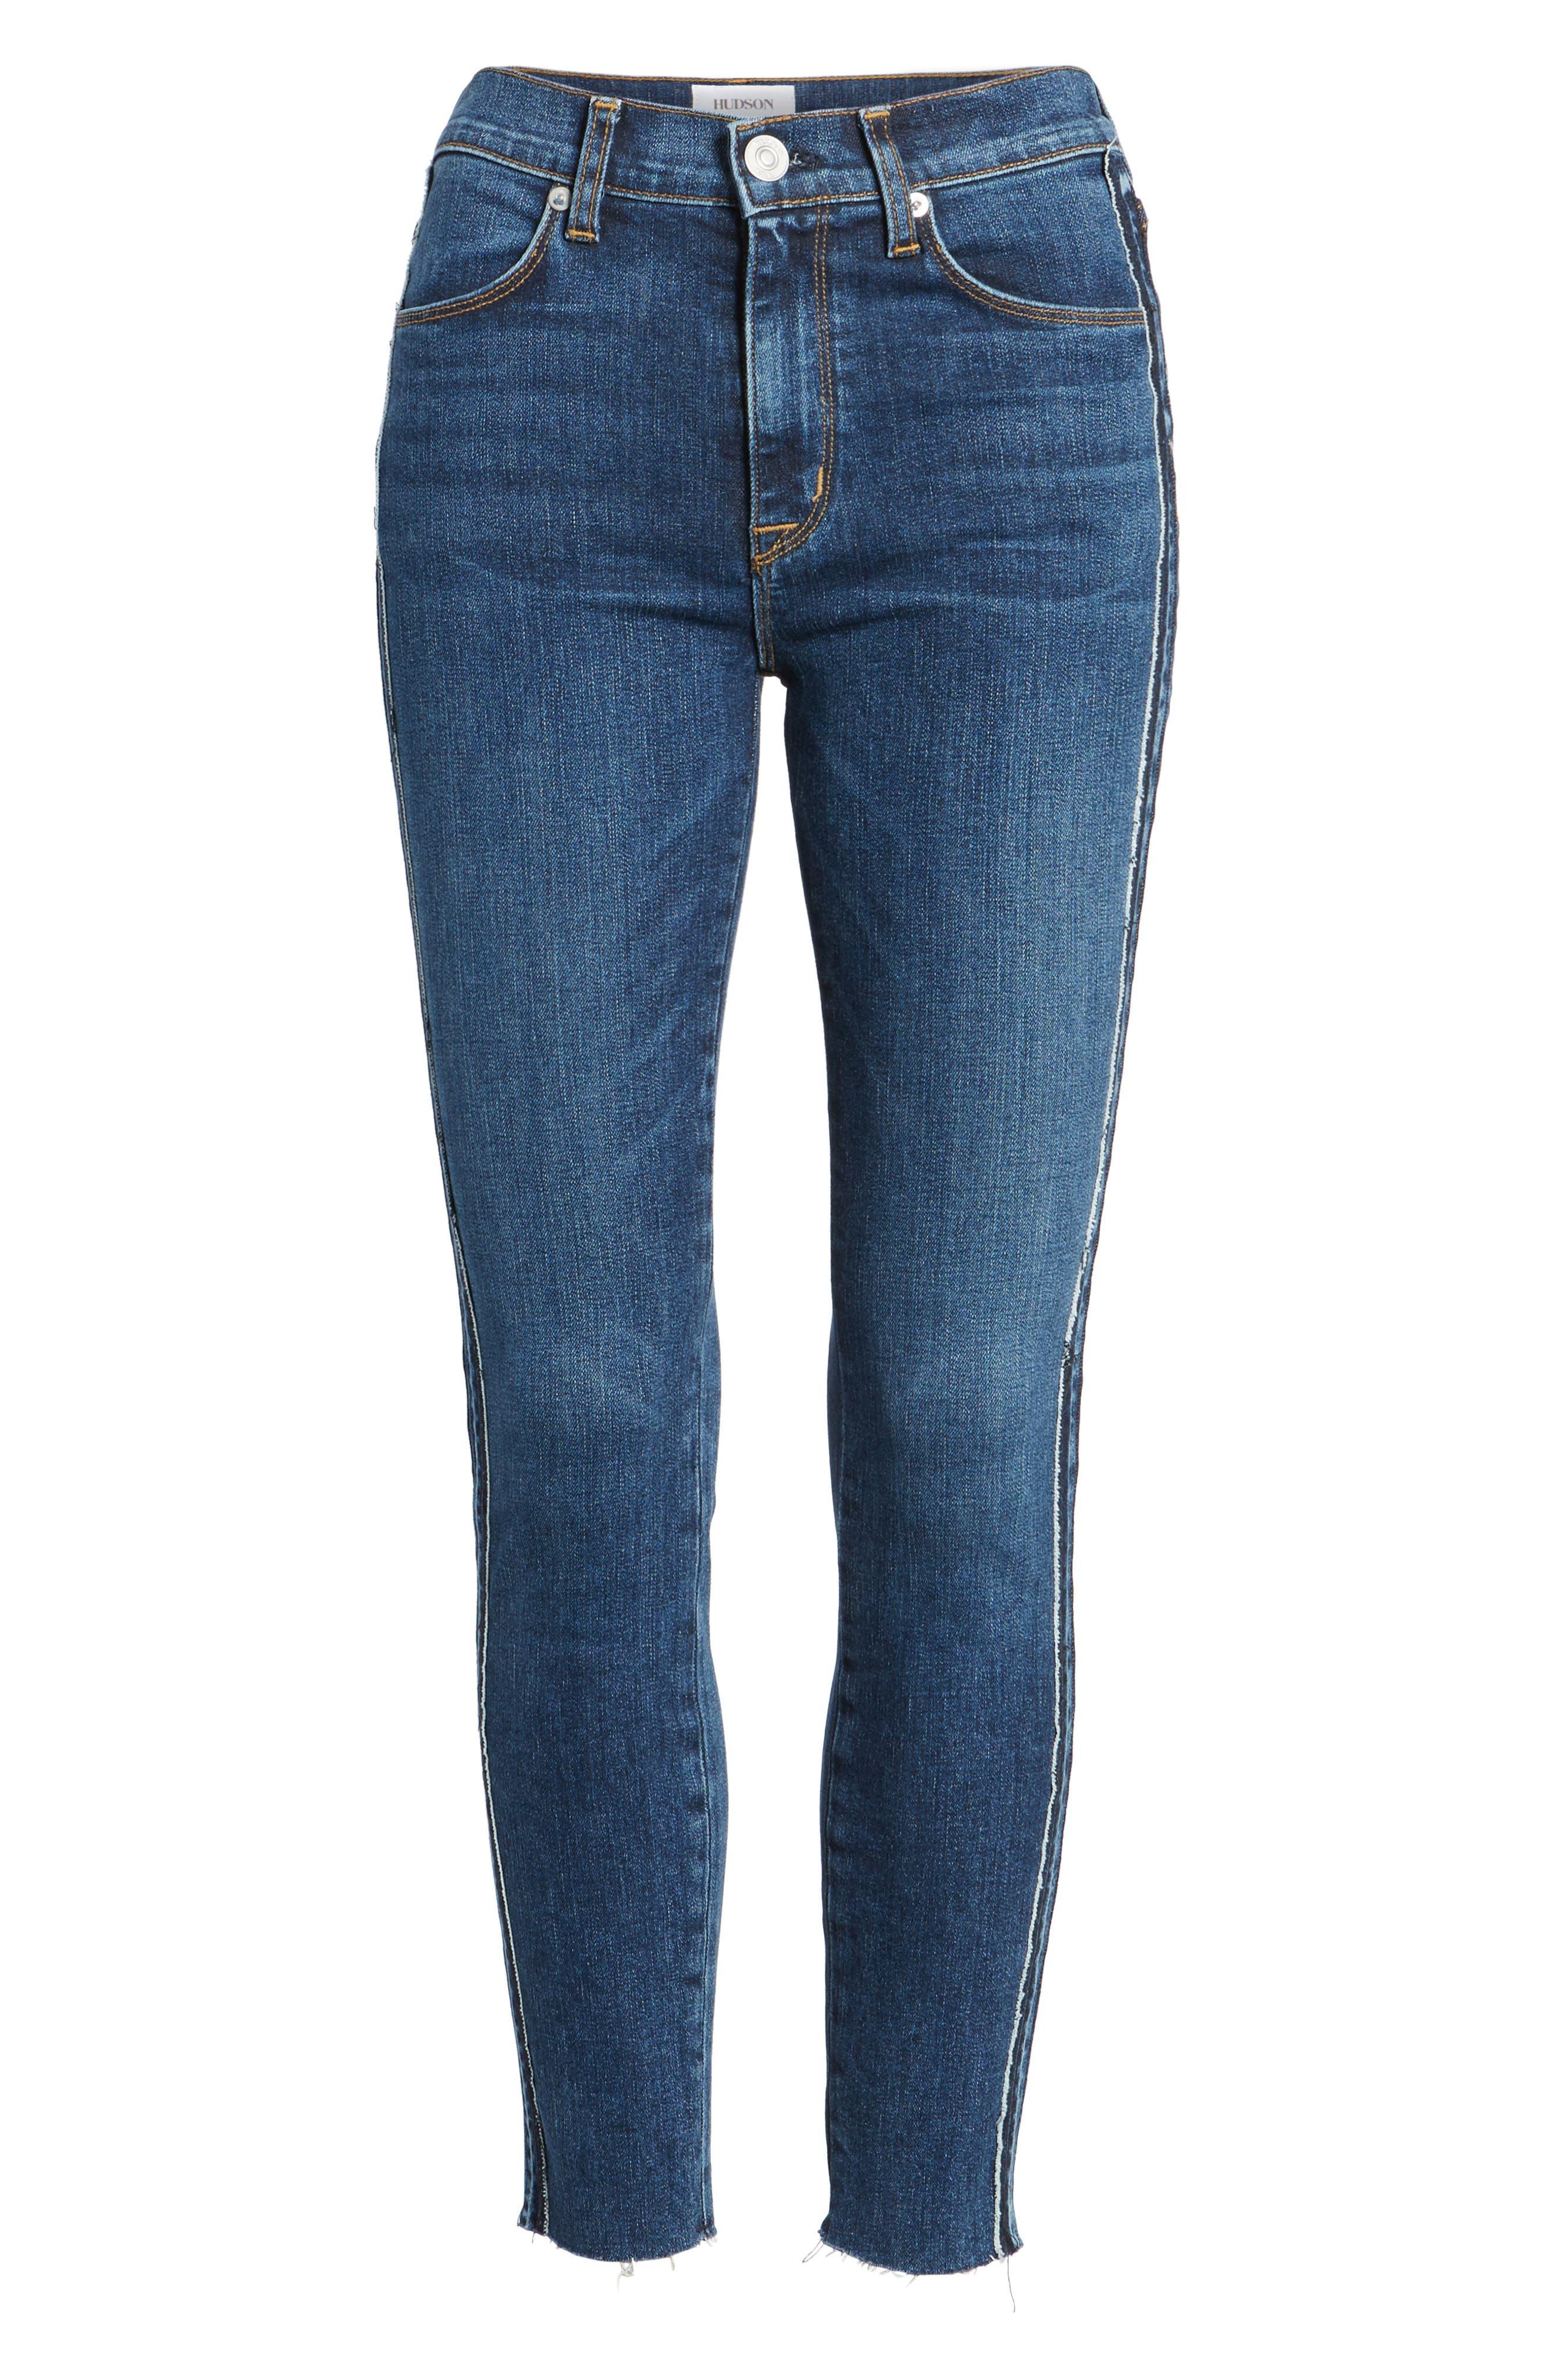 Barbara High Waist Super Skinny Jeans,                             Alternate thumbnail 7, color,                             Fatal